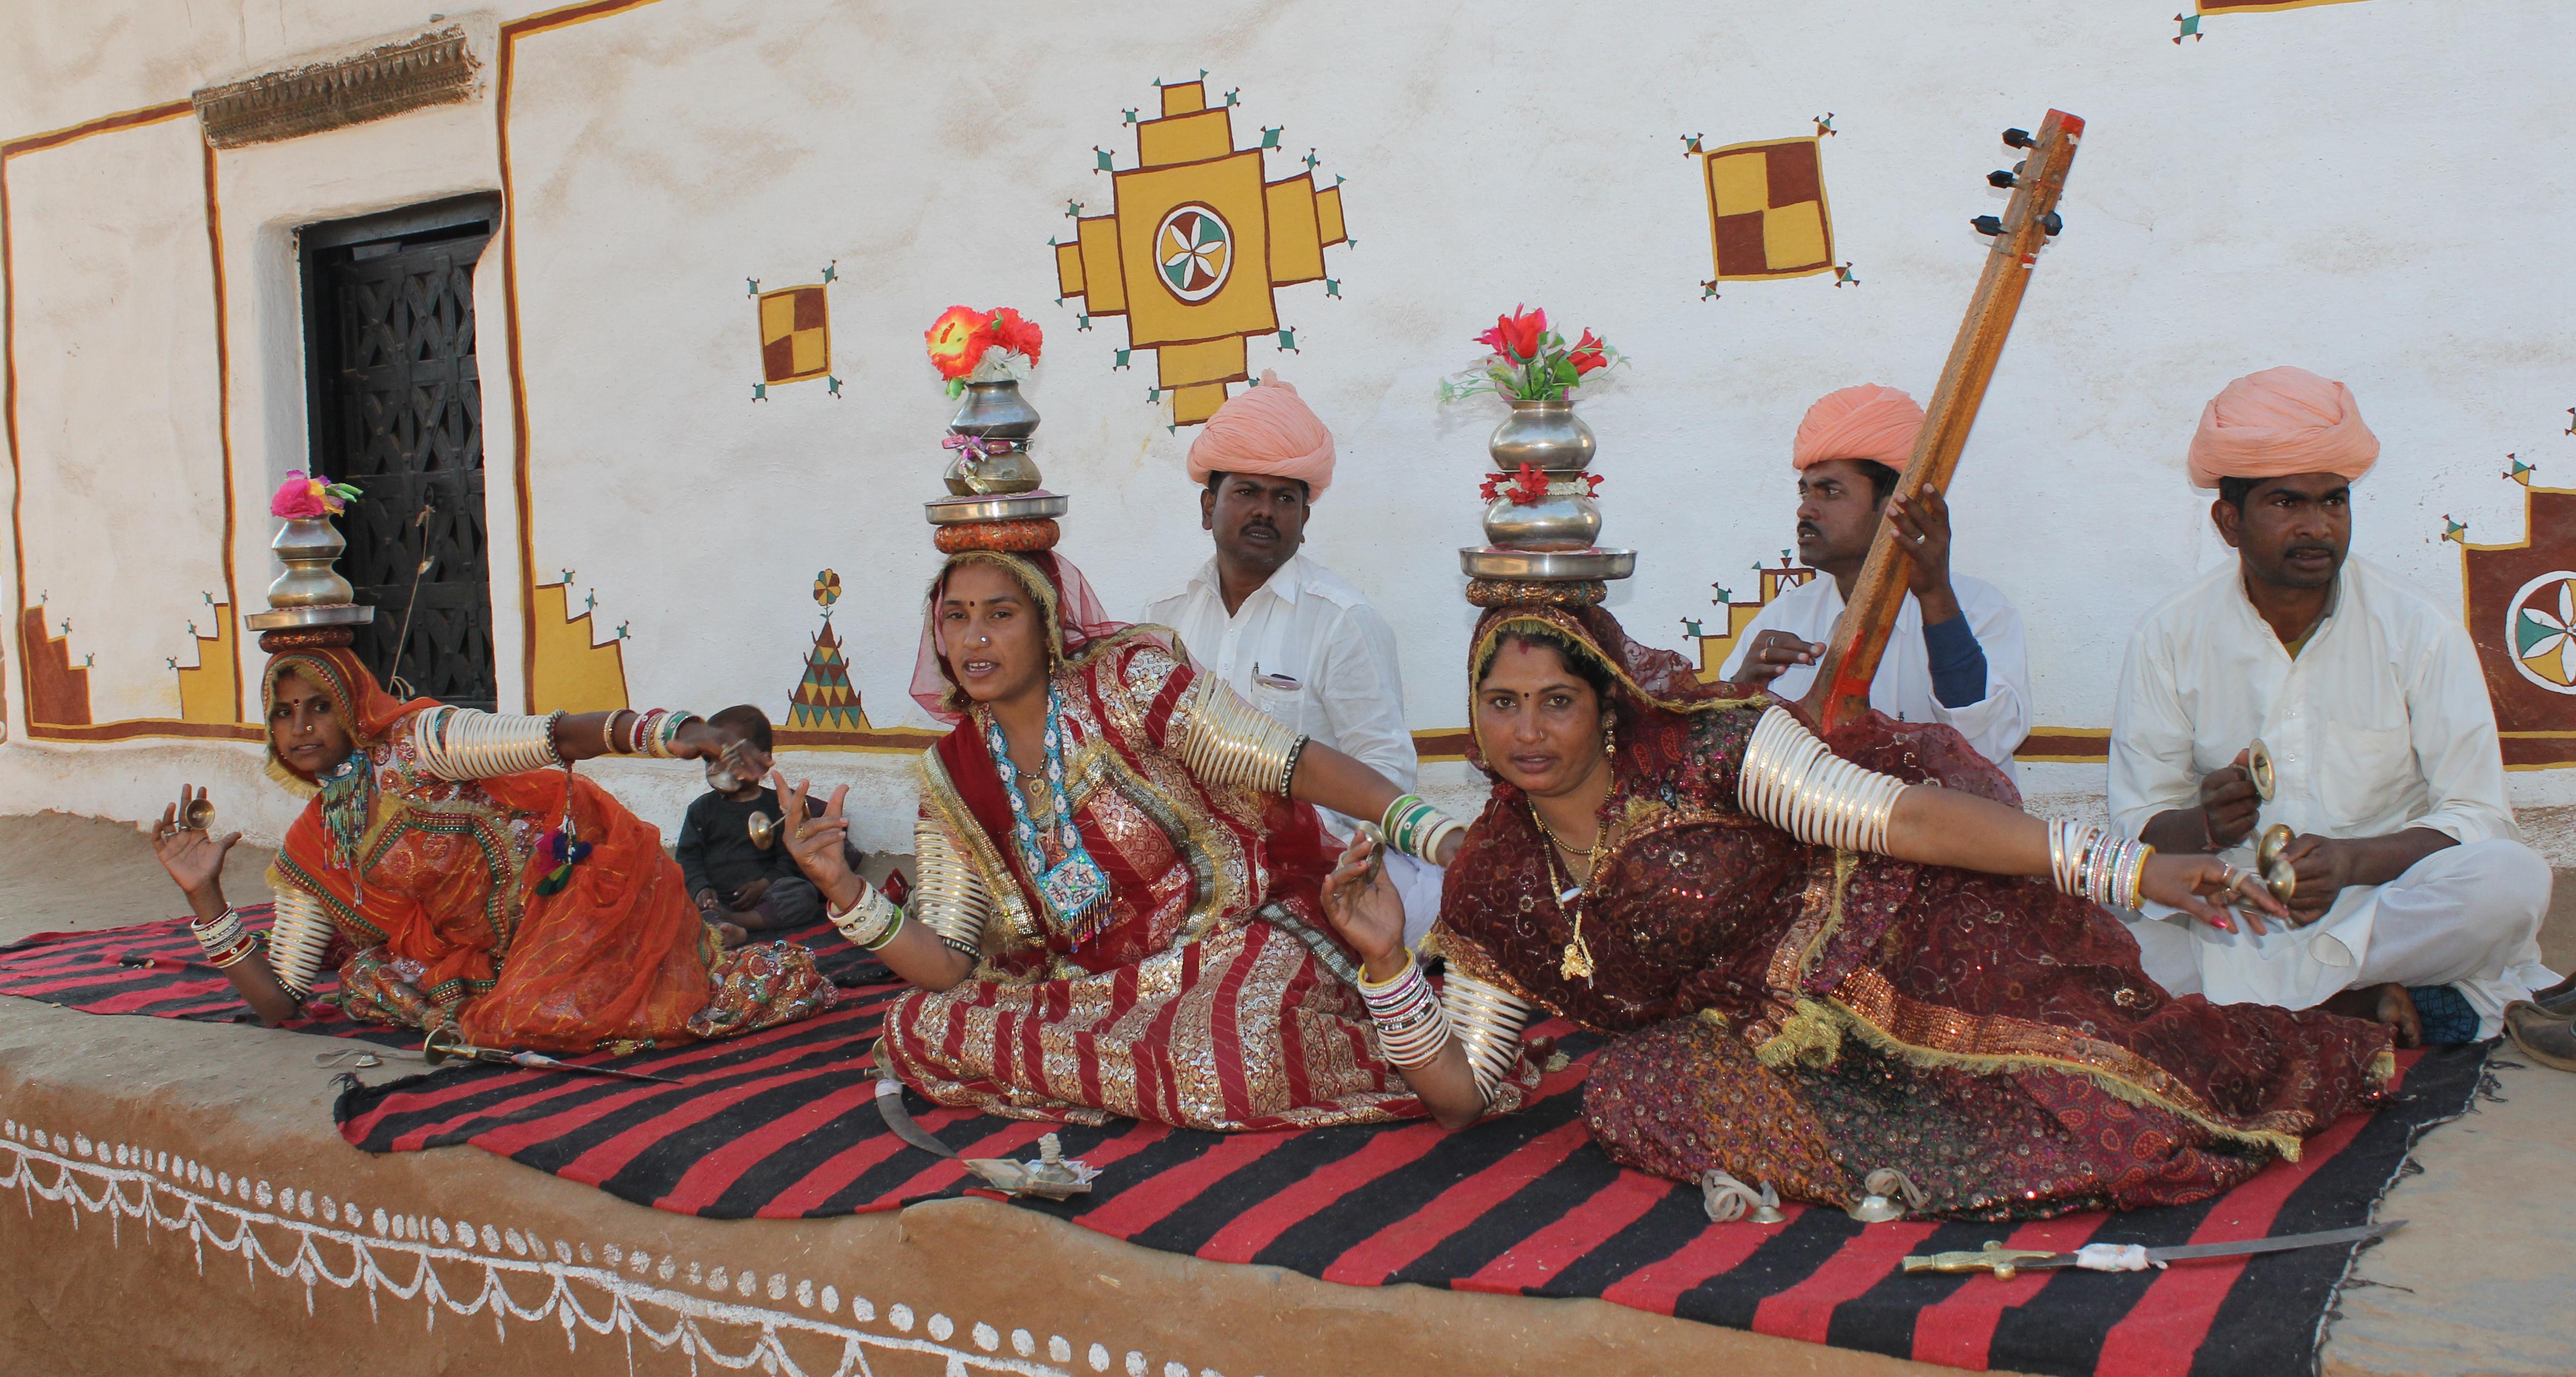 File:Thera tali at shilpgram.JPG - Wikimedia Commons